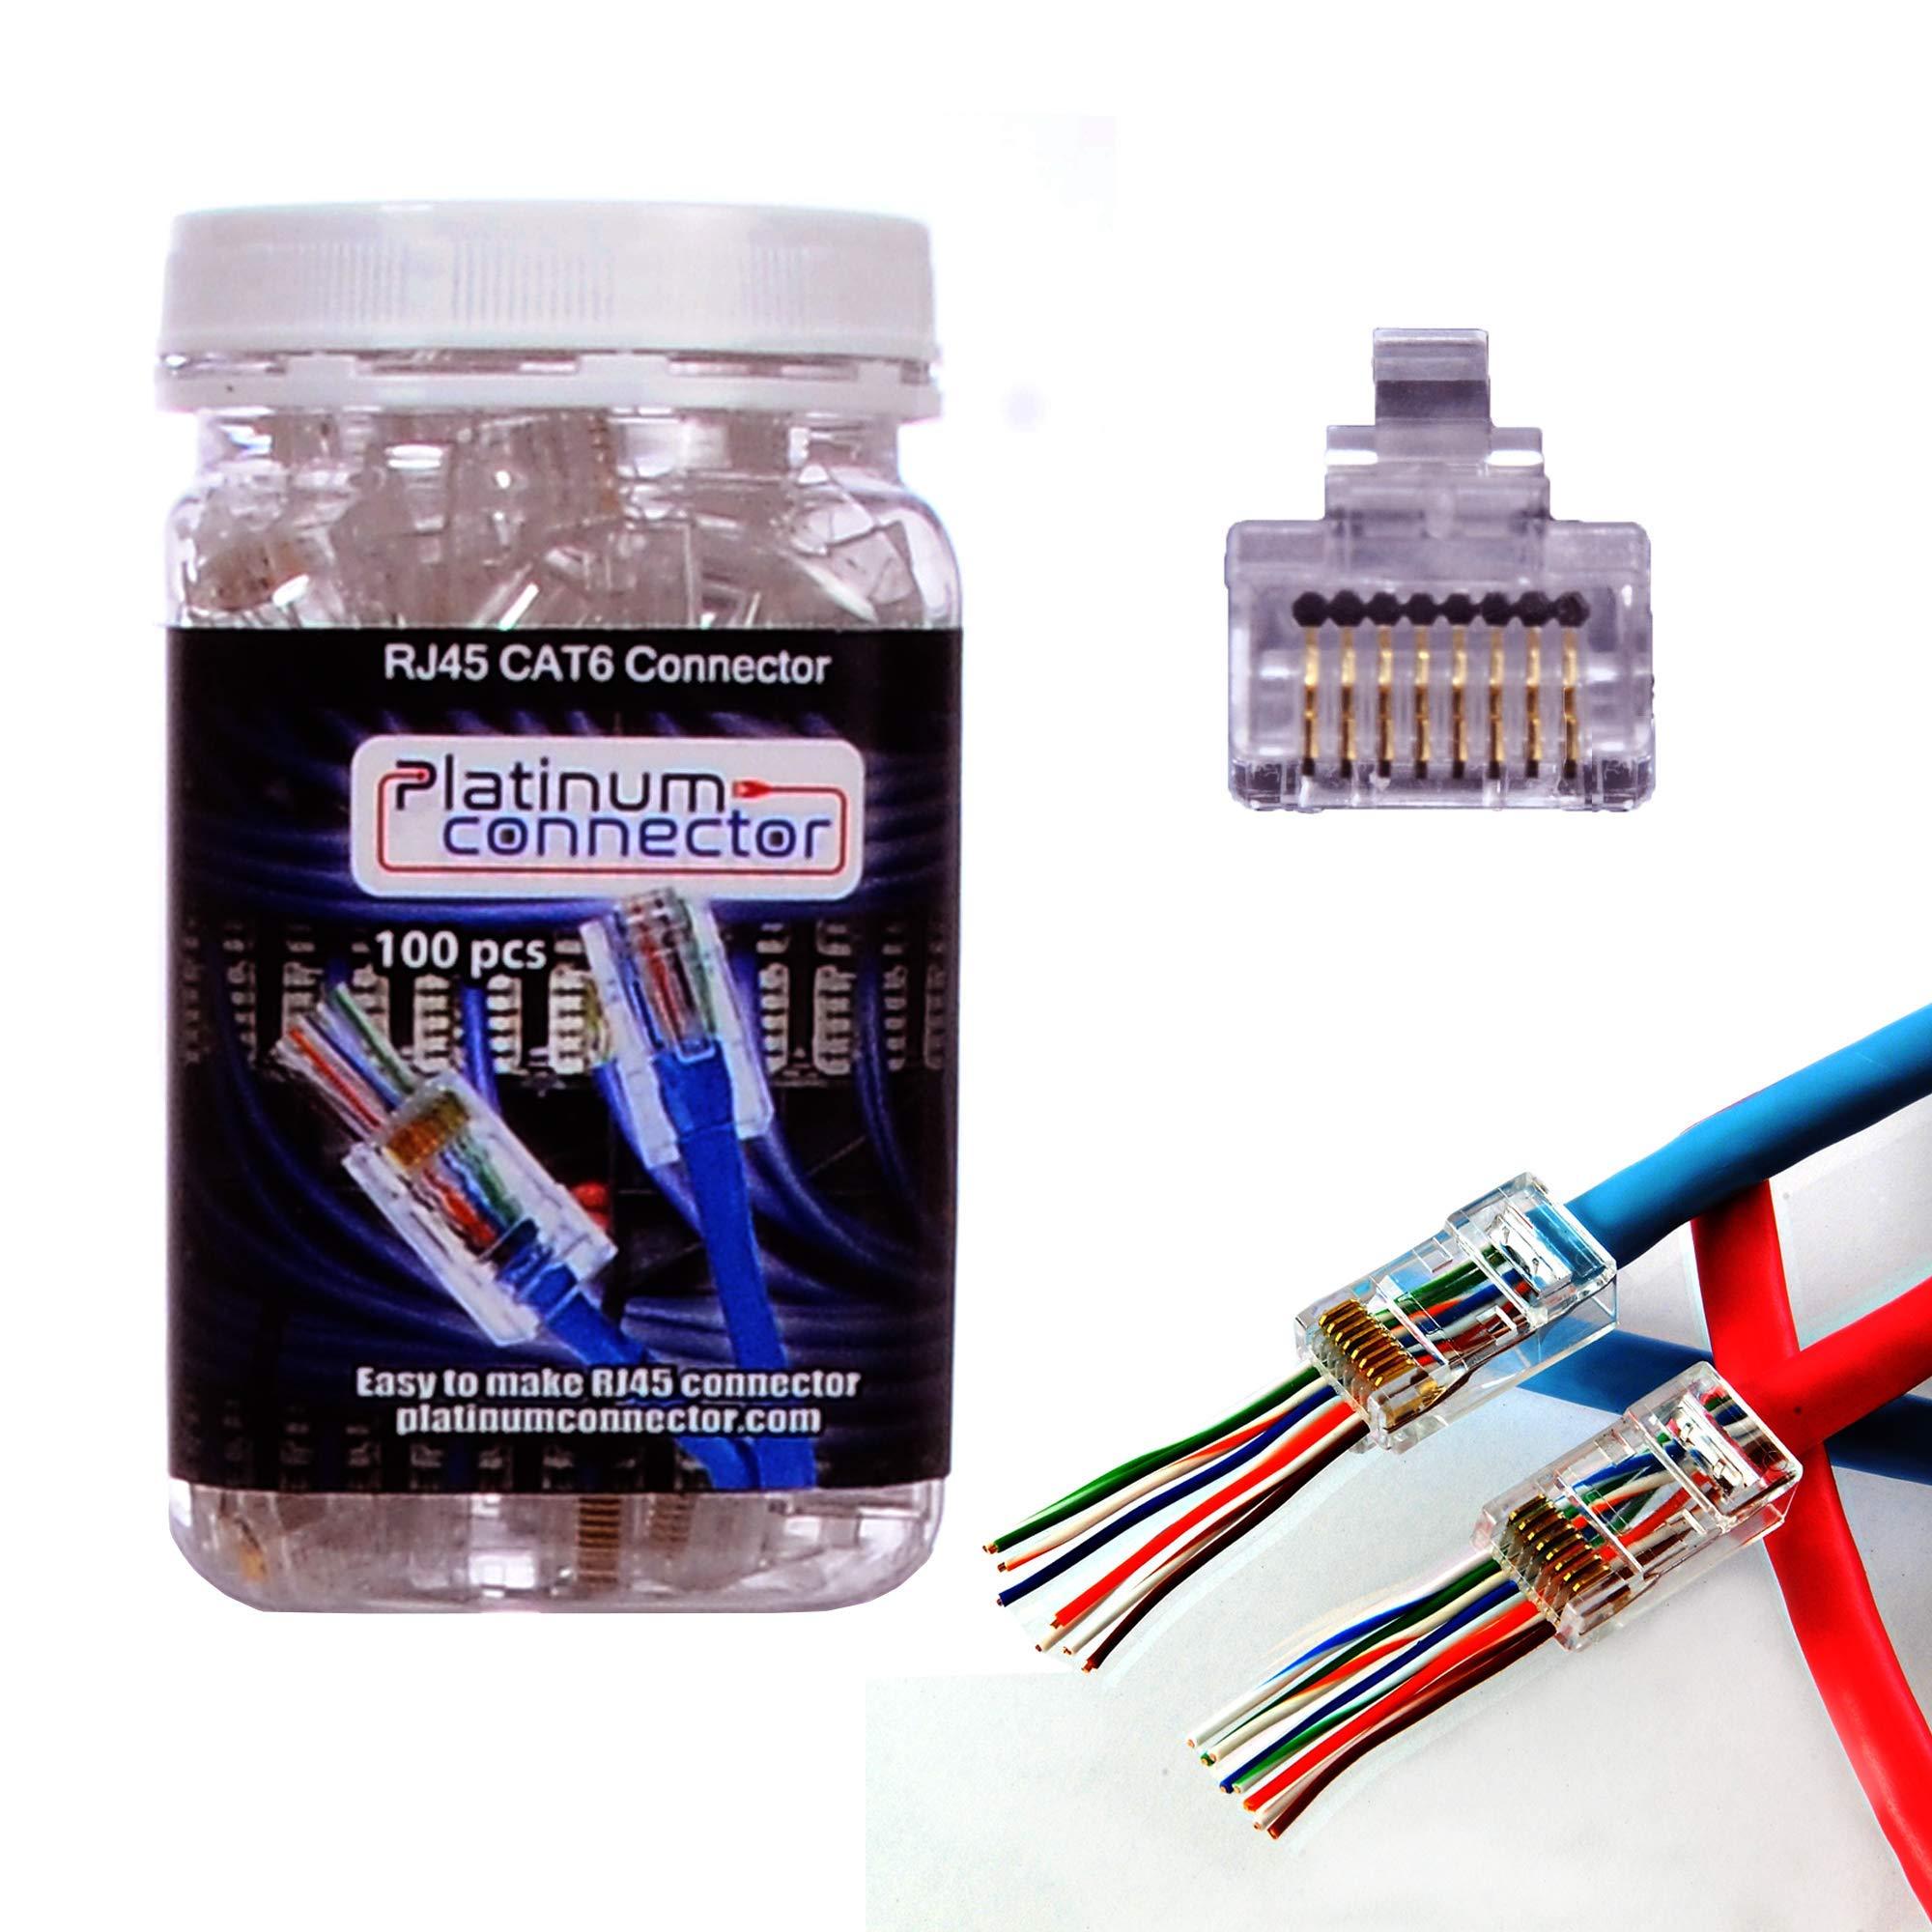 Platinum Connector cable connector RJ45 8P8C CAT6 - End pass through Ethernet one-Piece High Performance modular plug (100 Pieces) by Platinum Connector